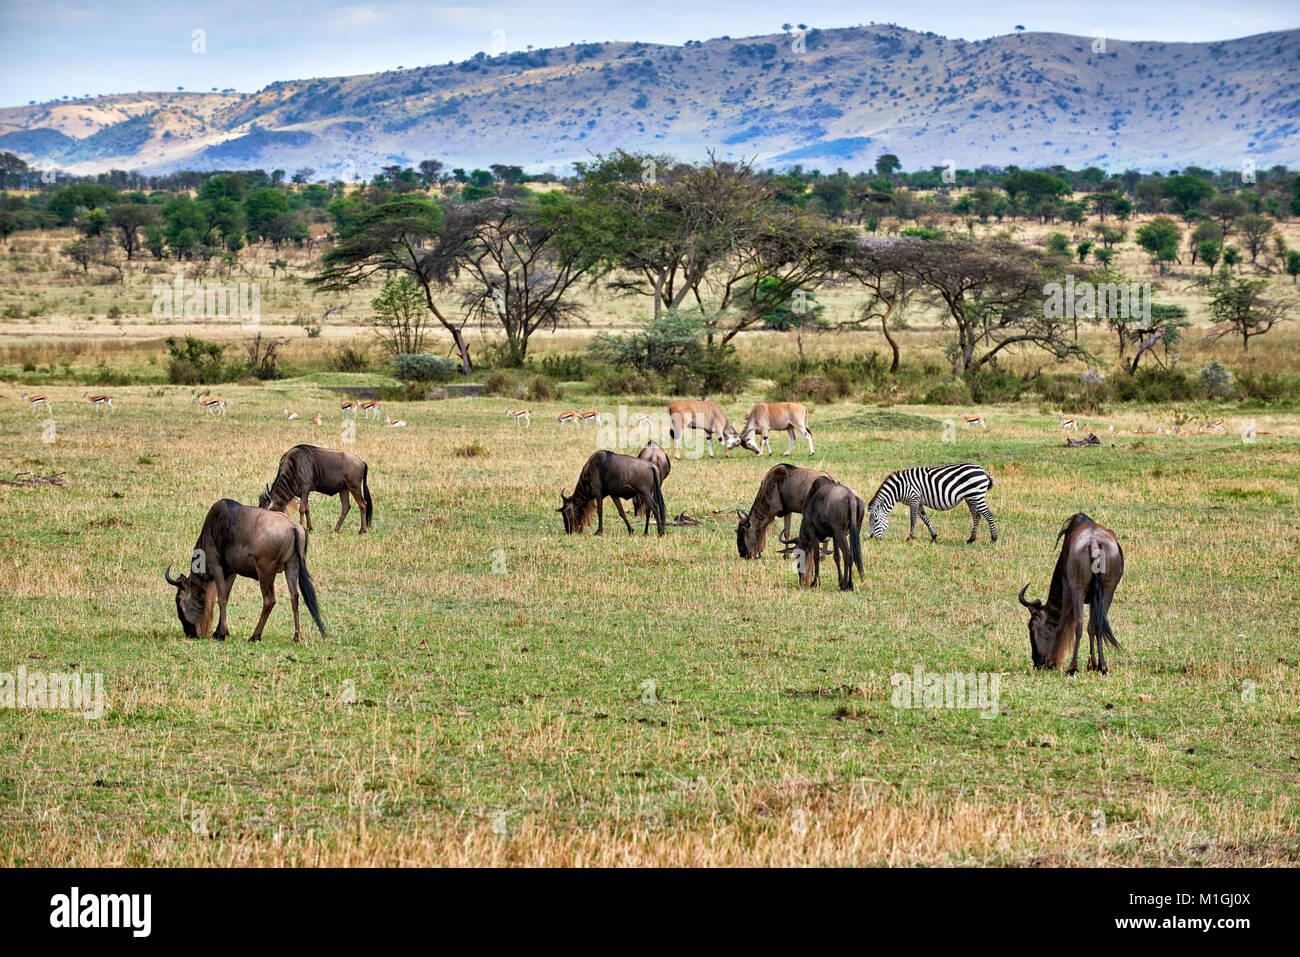 mixed anteloped in landscape of Serengeti National Park, UNESCO world heritage site, Tanzania, Africa - Stock Image